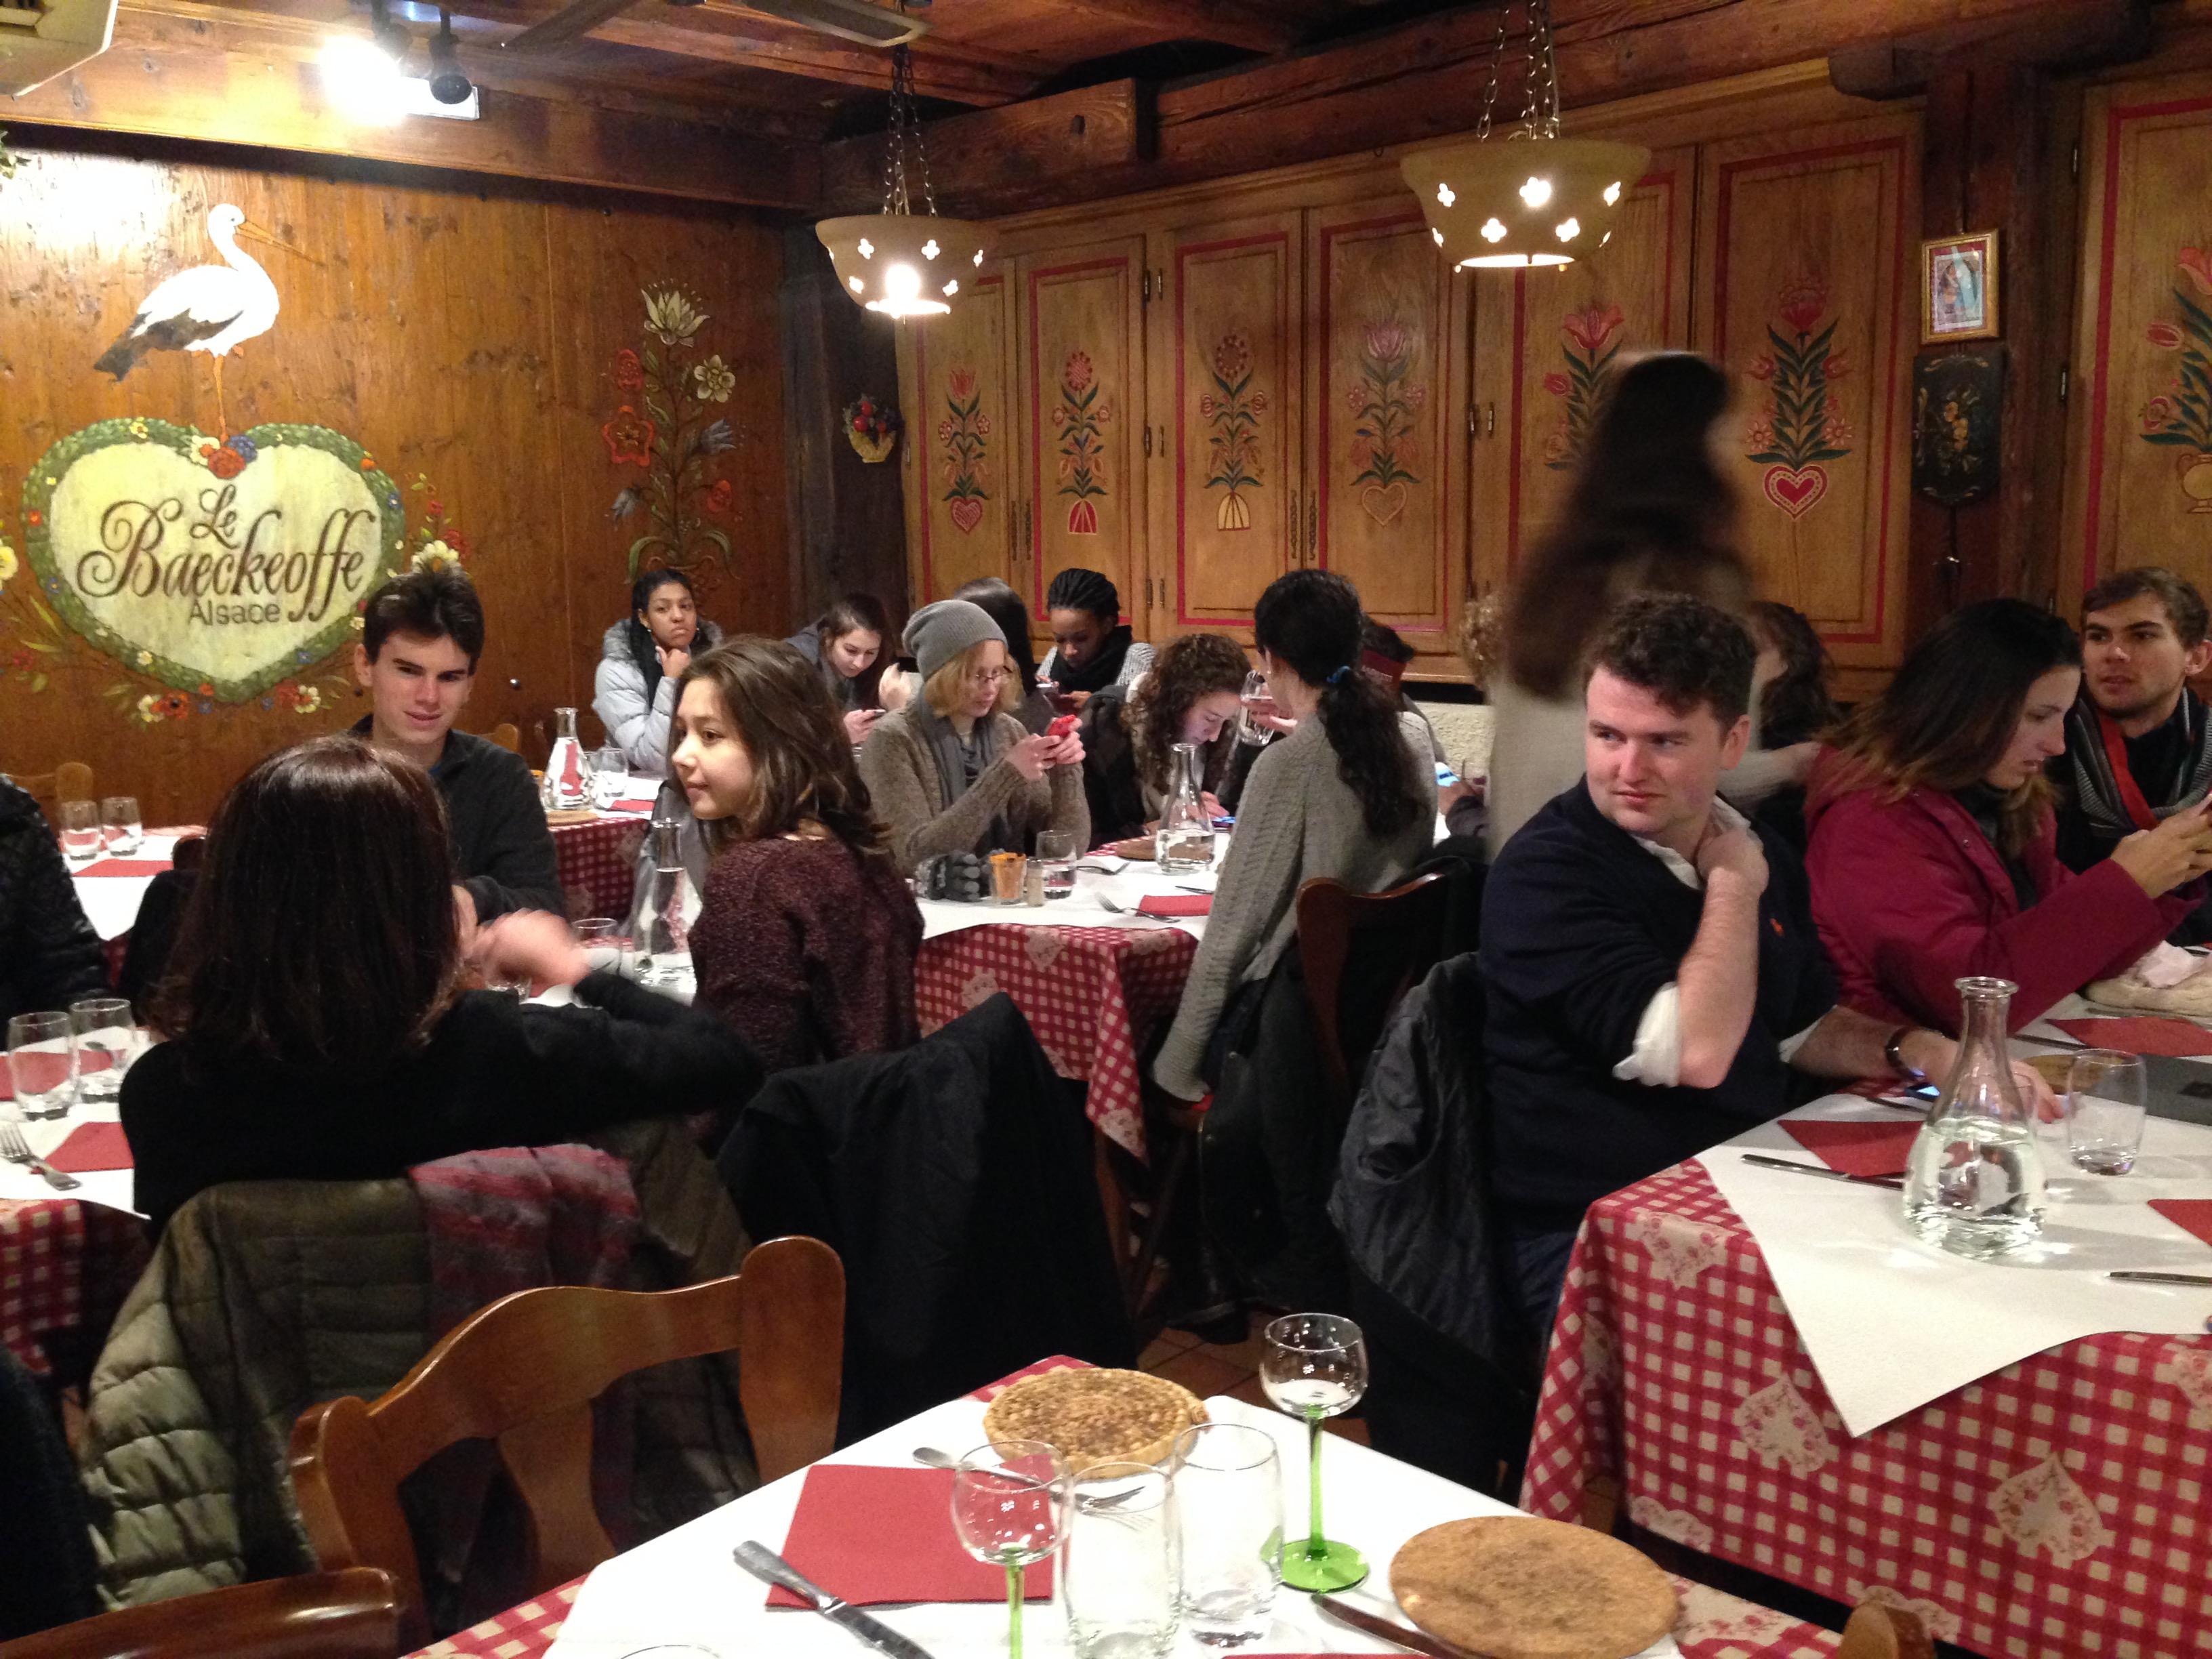 Restaurant le Baeckeoffe d'Alsace